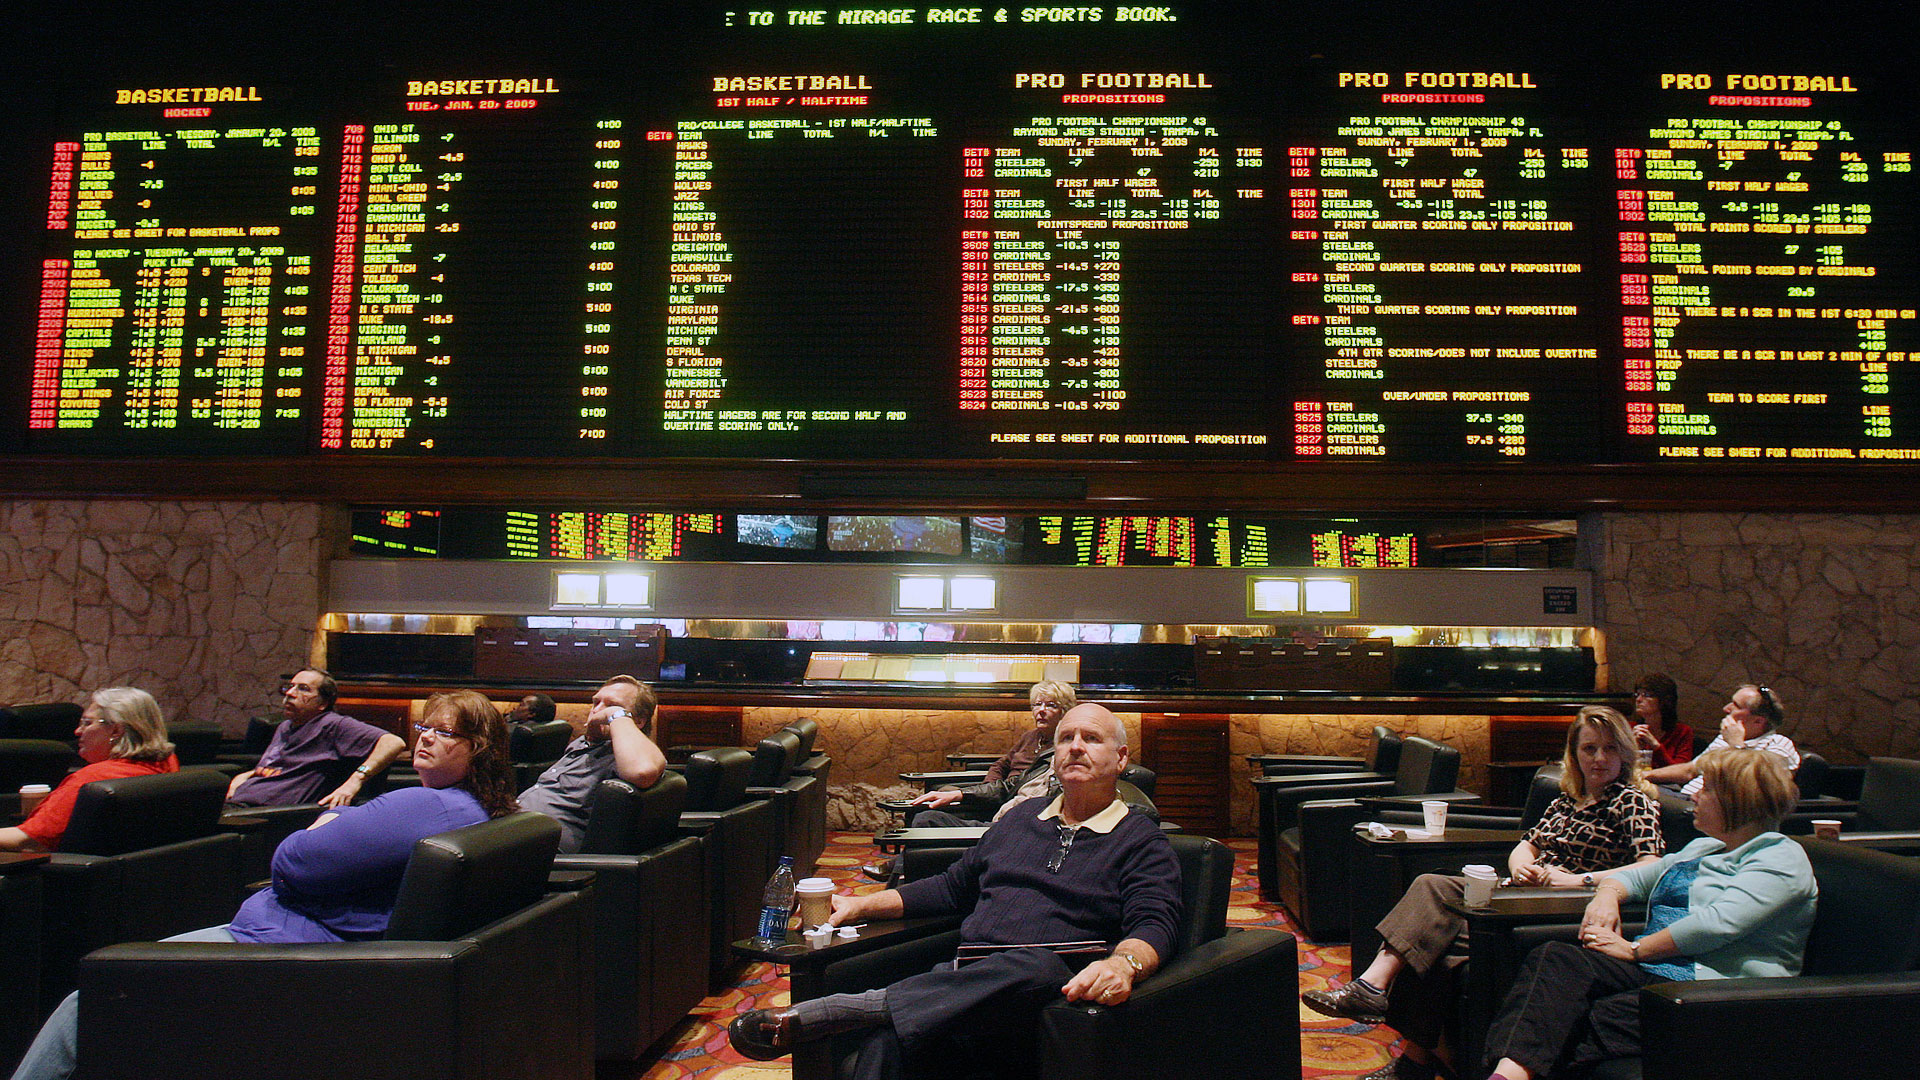 Sports gambling terms slang